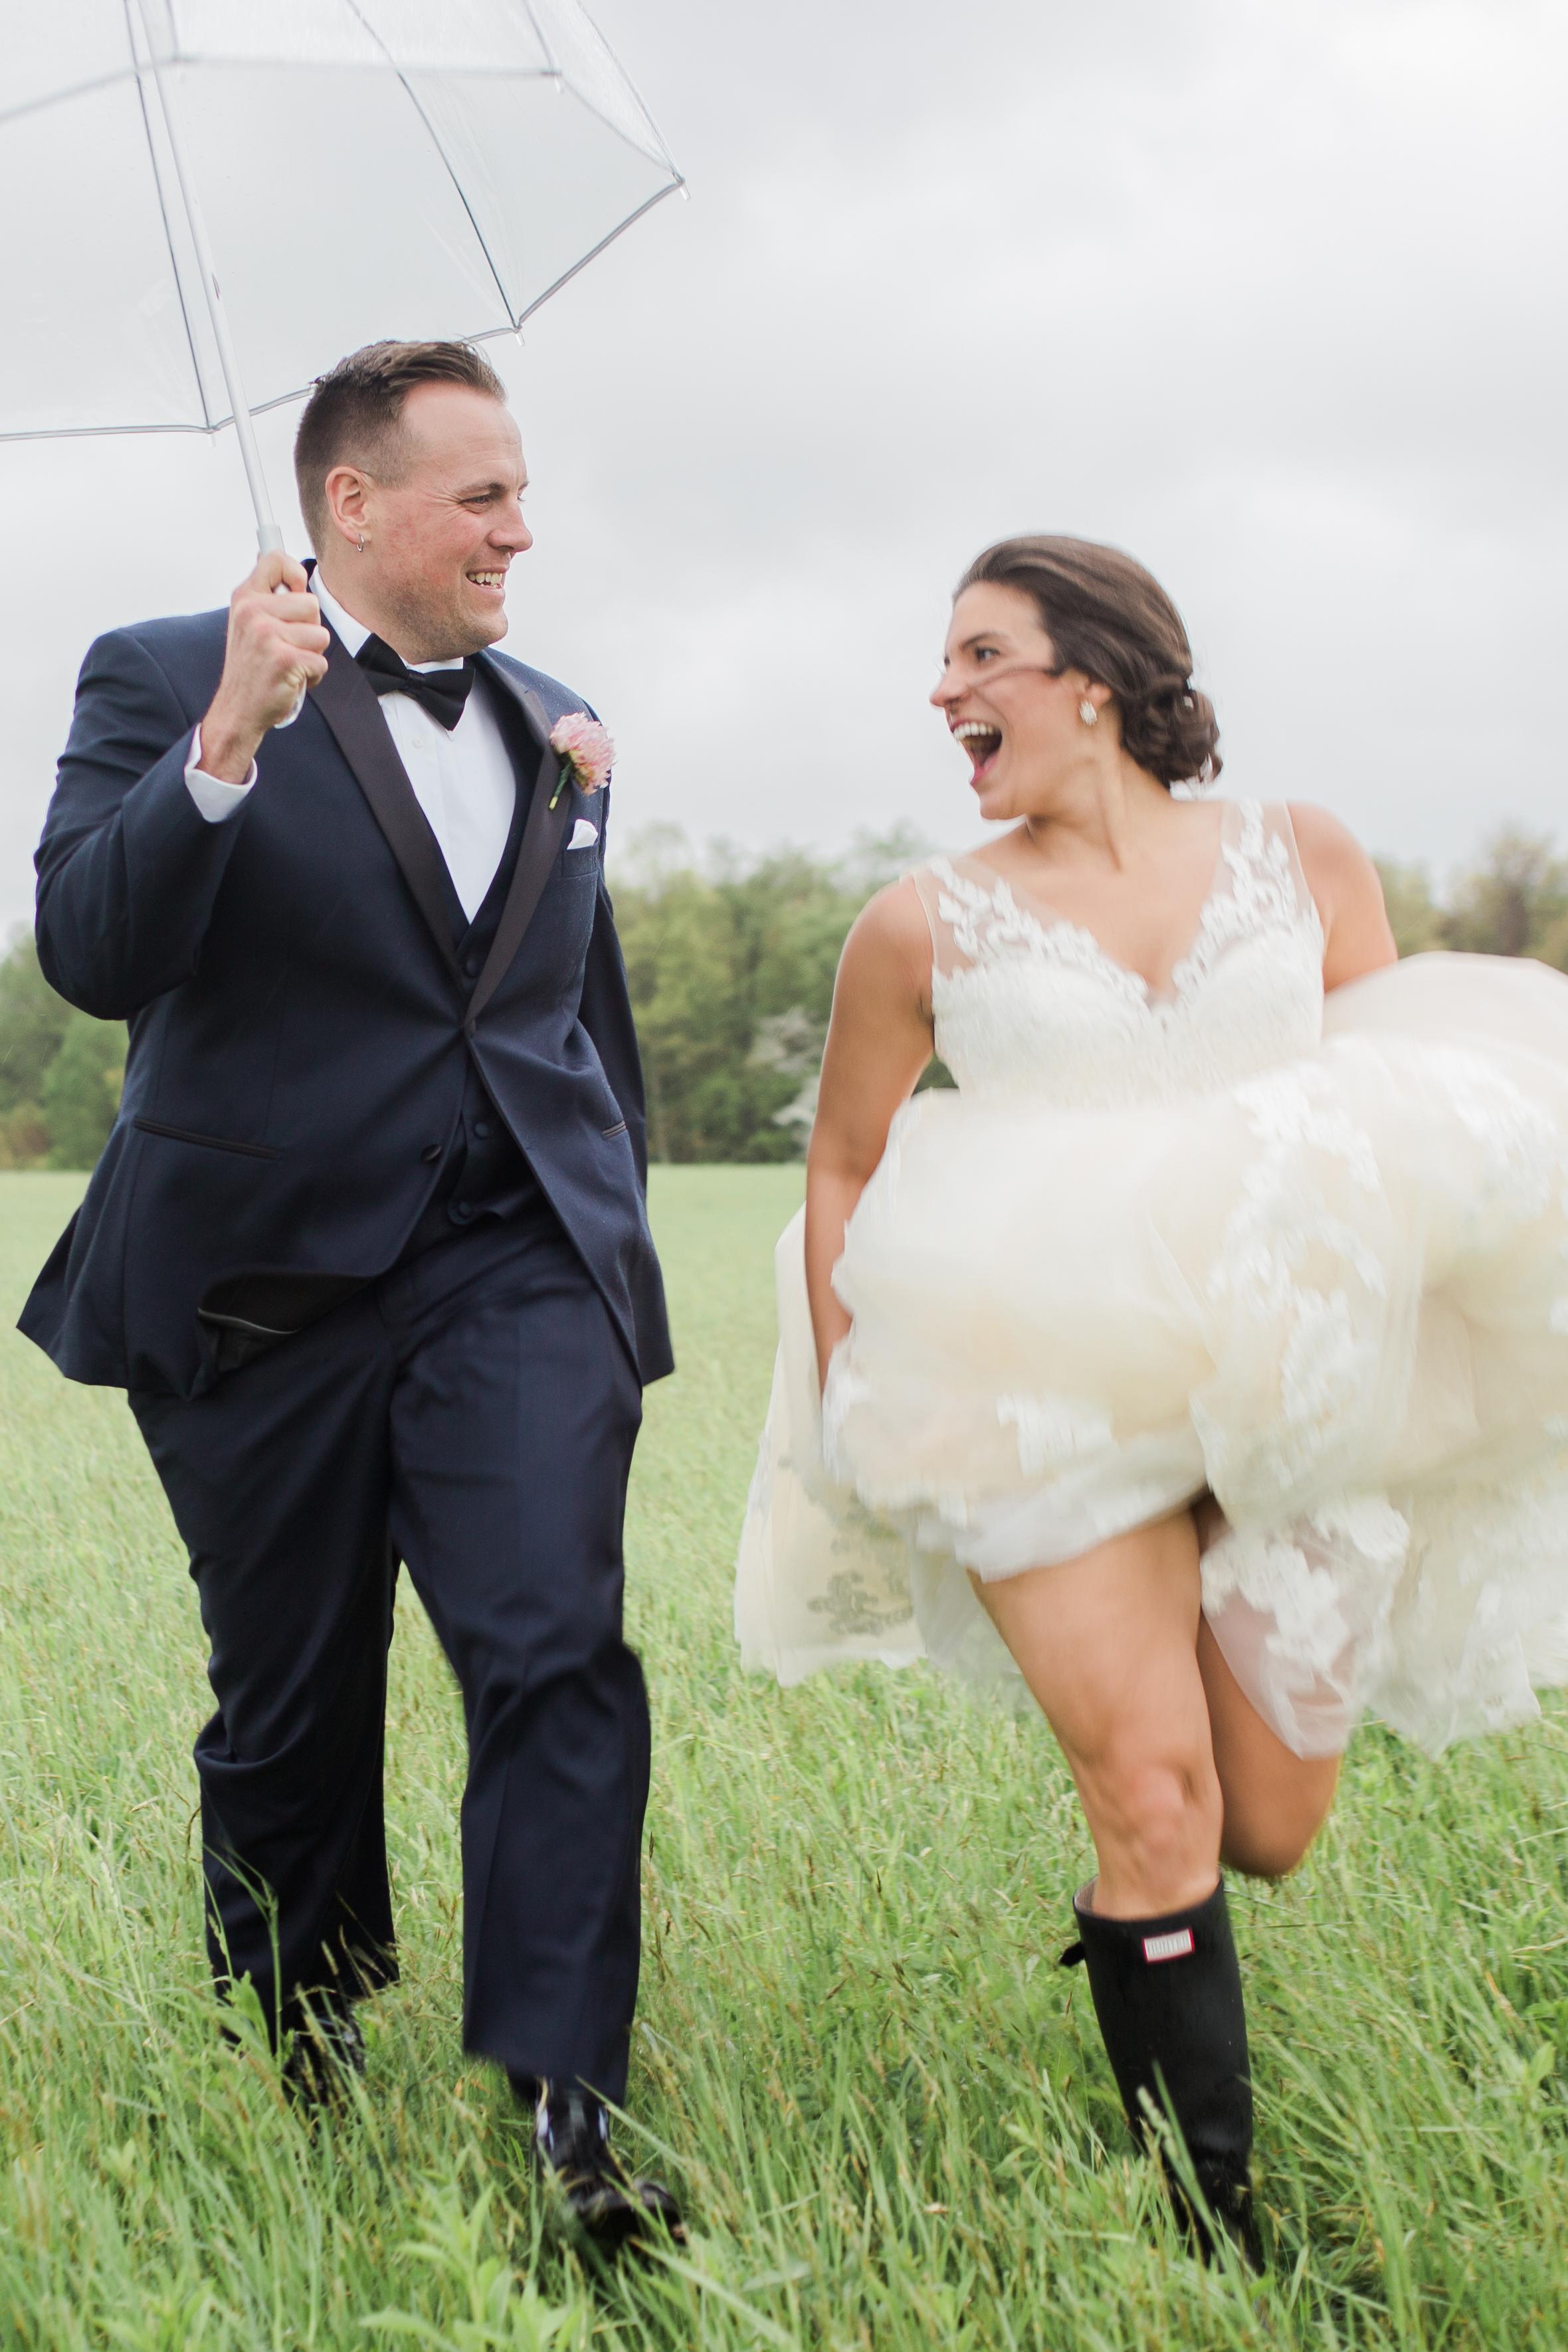 Kayla & Luke, Rainy Day Farm Wedding